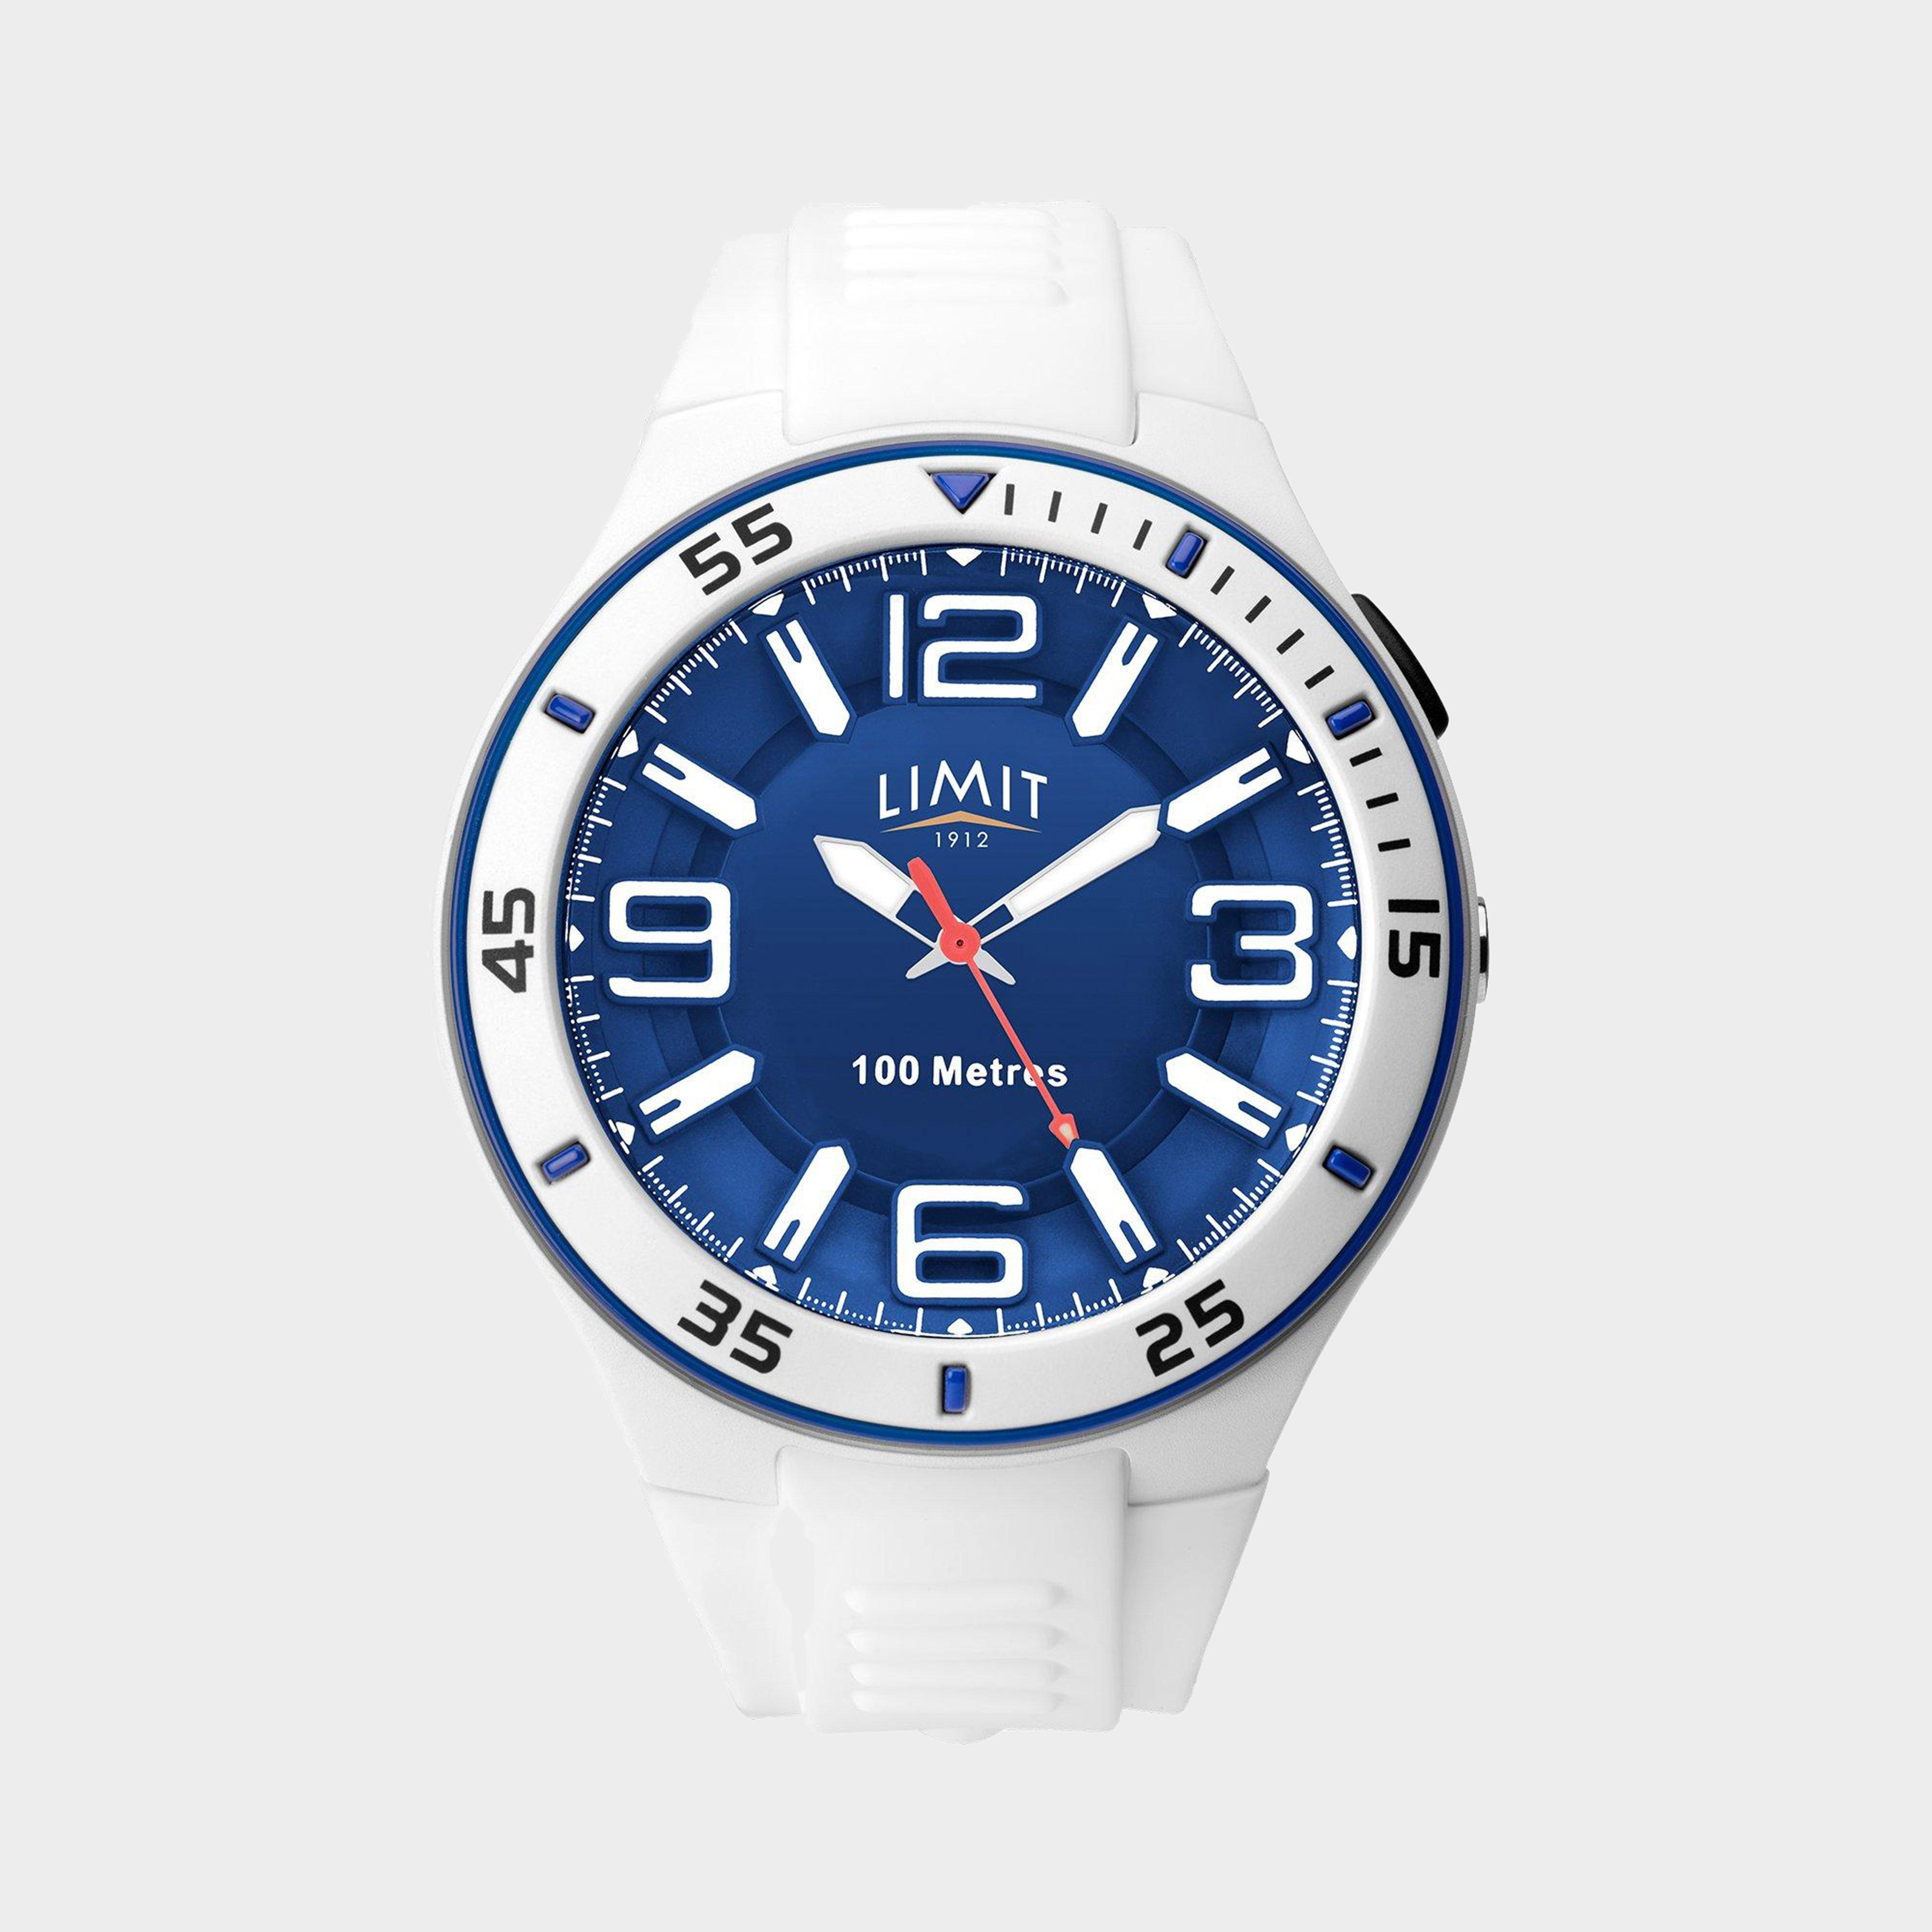 Limit Limit Active Analogue Sports Watch - White, White